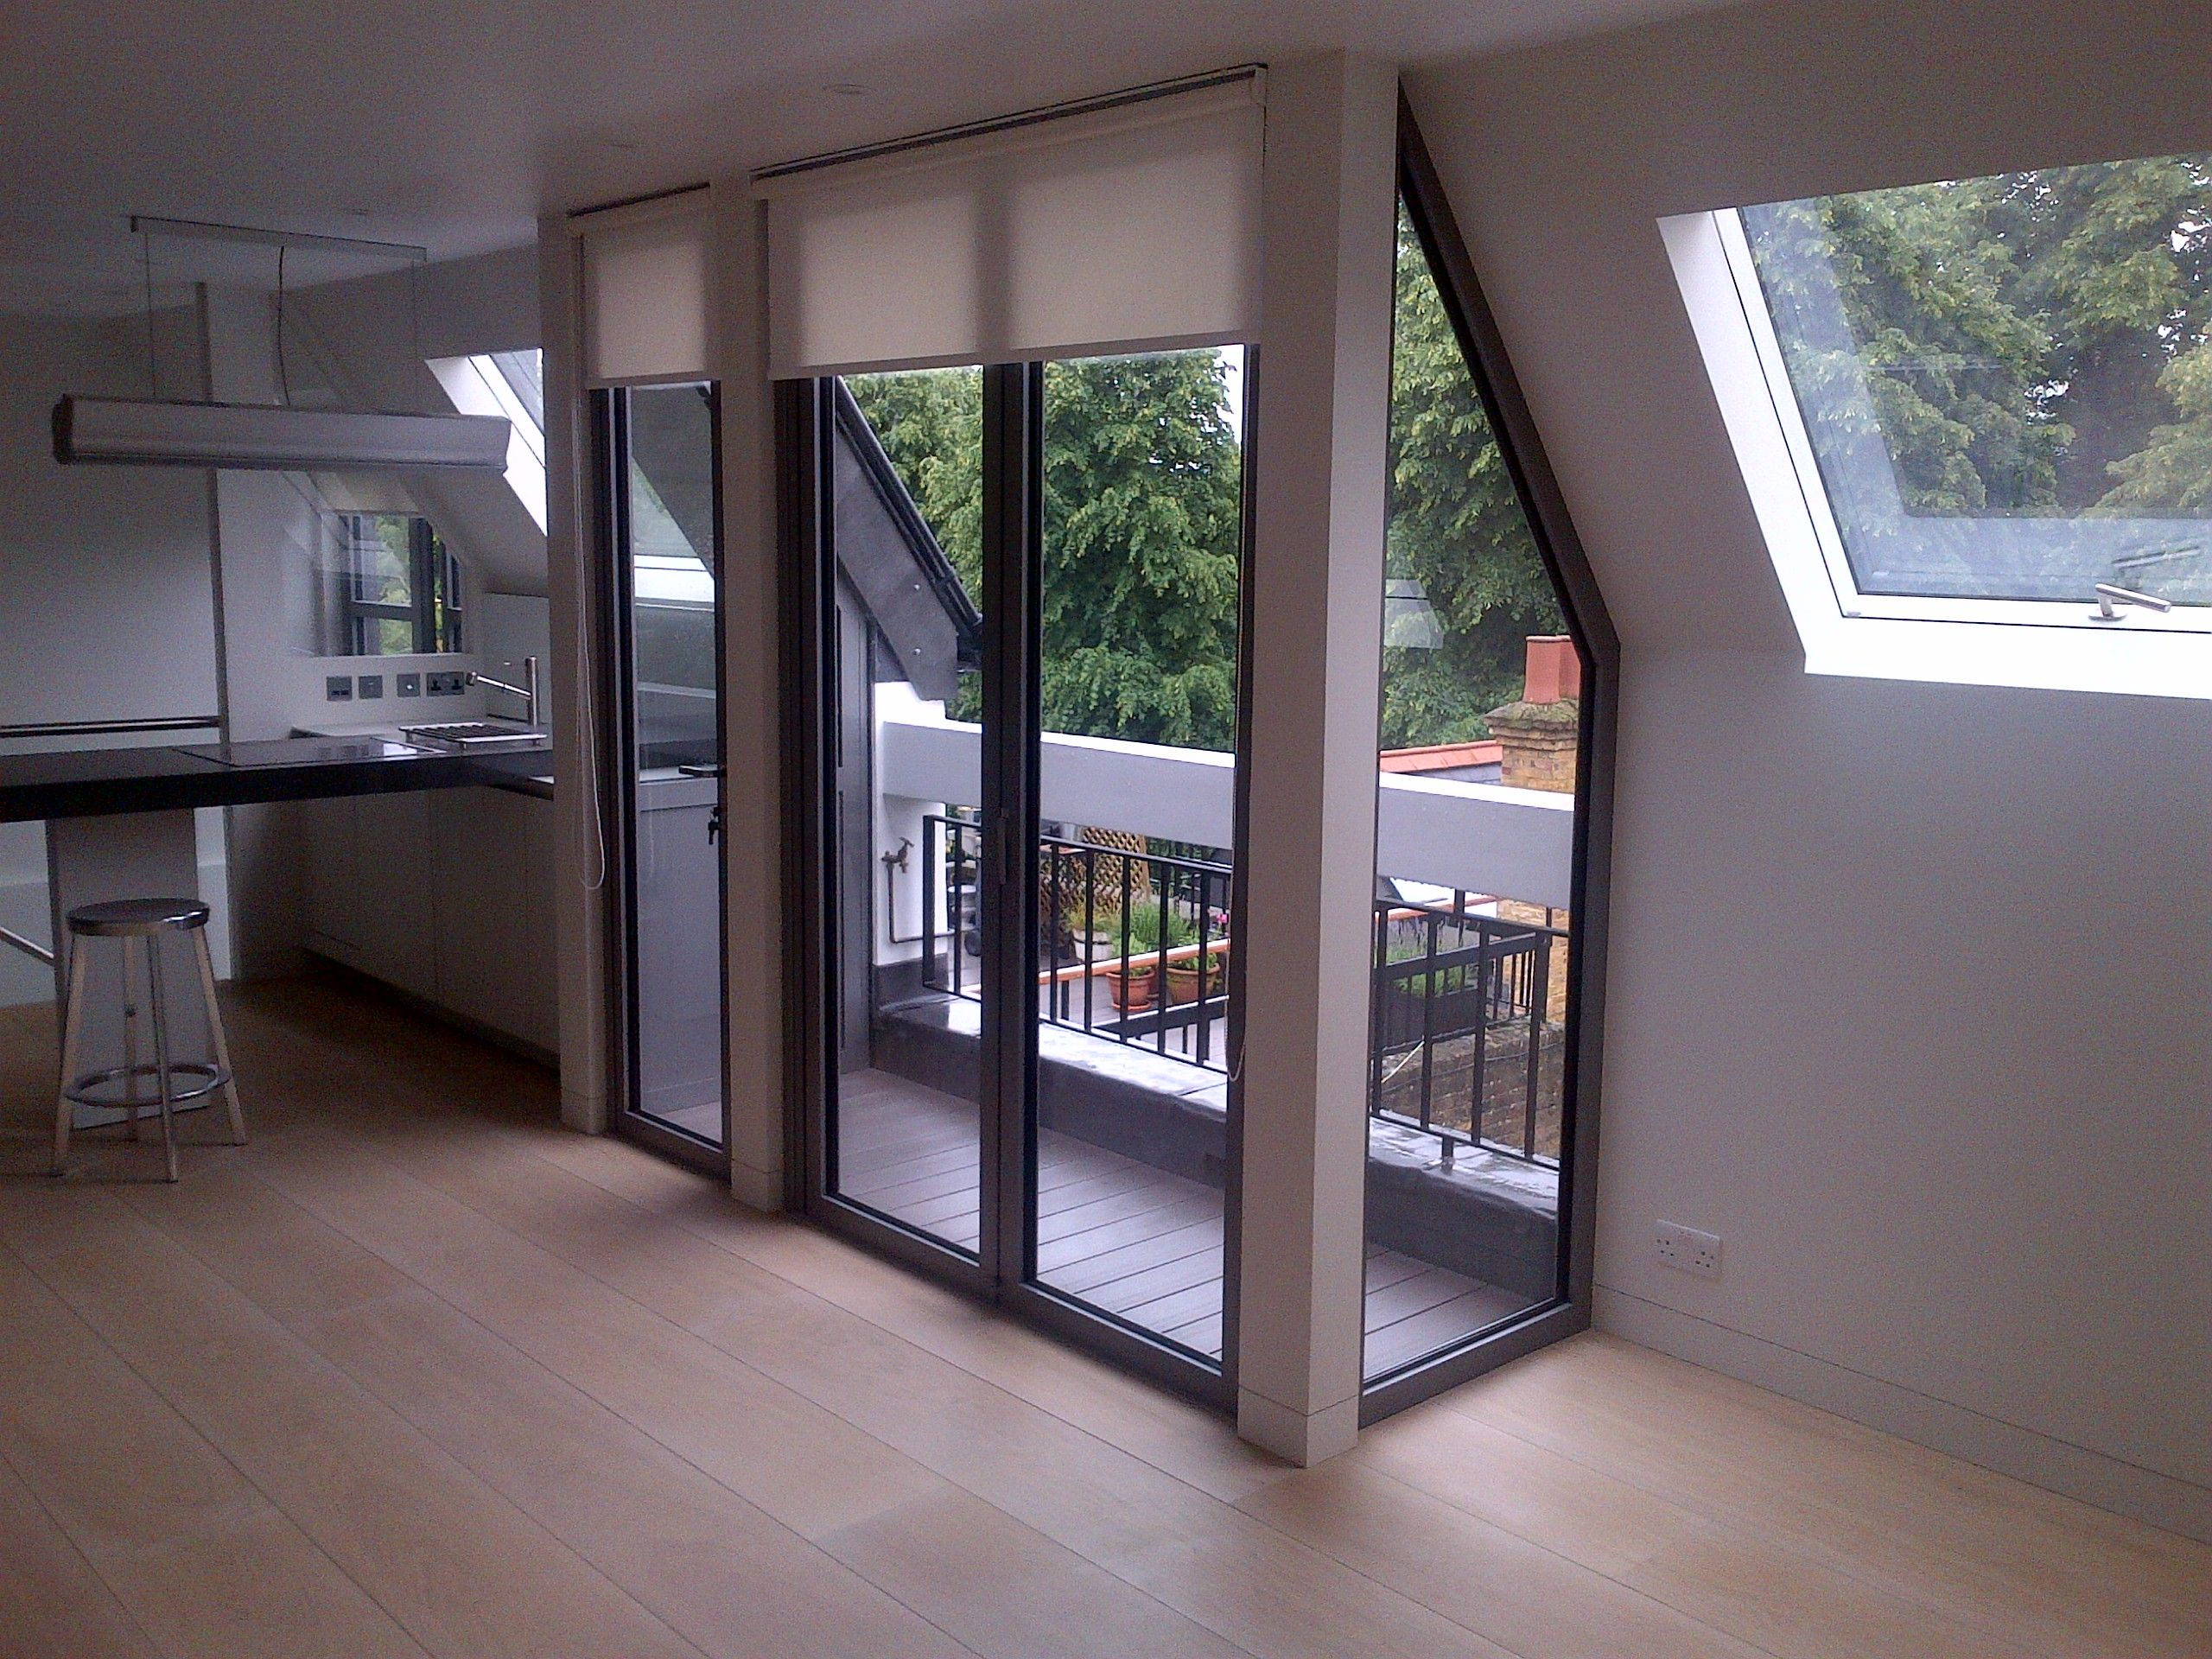 Odadan Balkon Cikarmak Dachausbau In 2019 Dachgeschoss